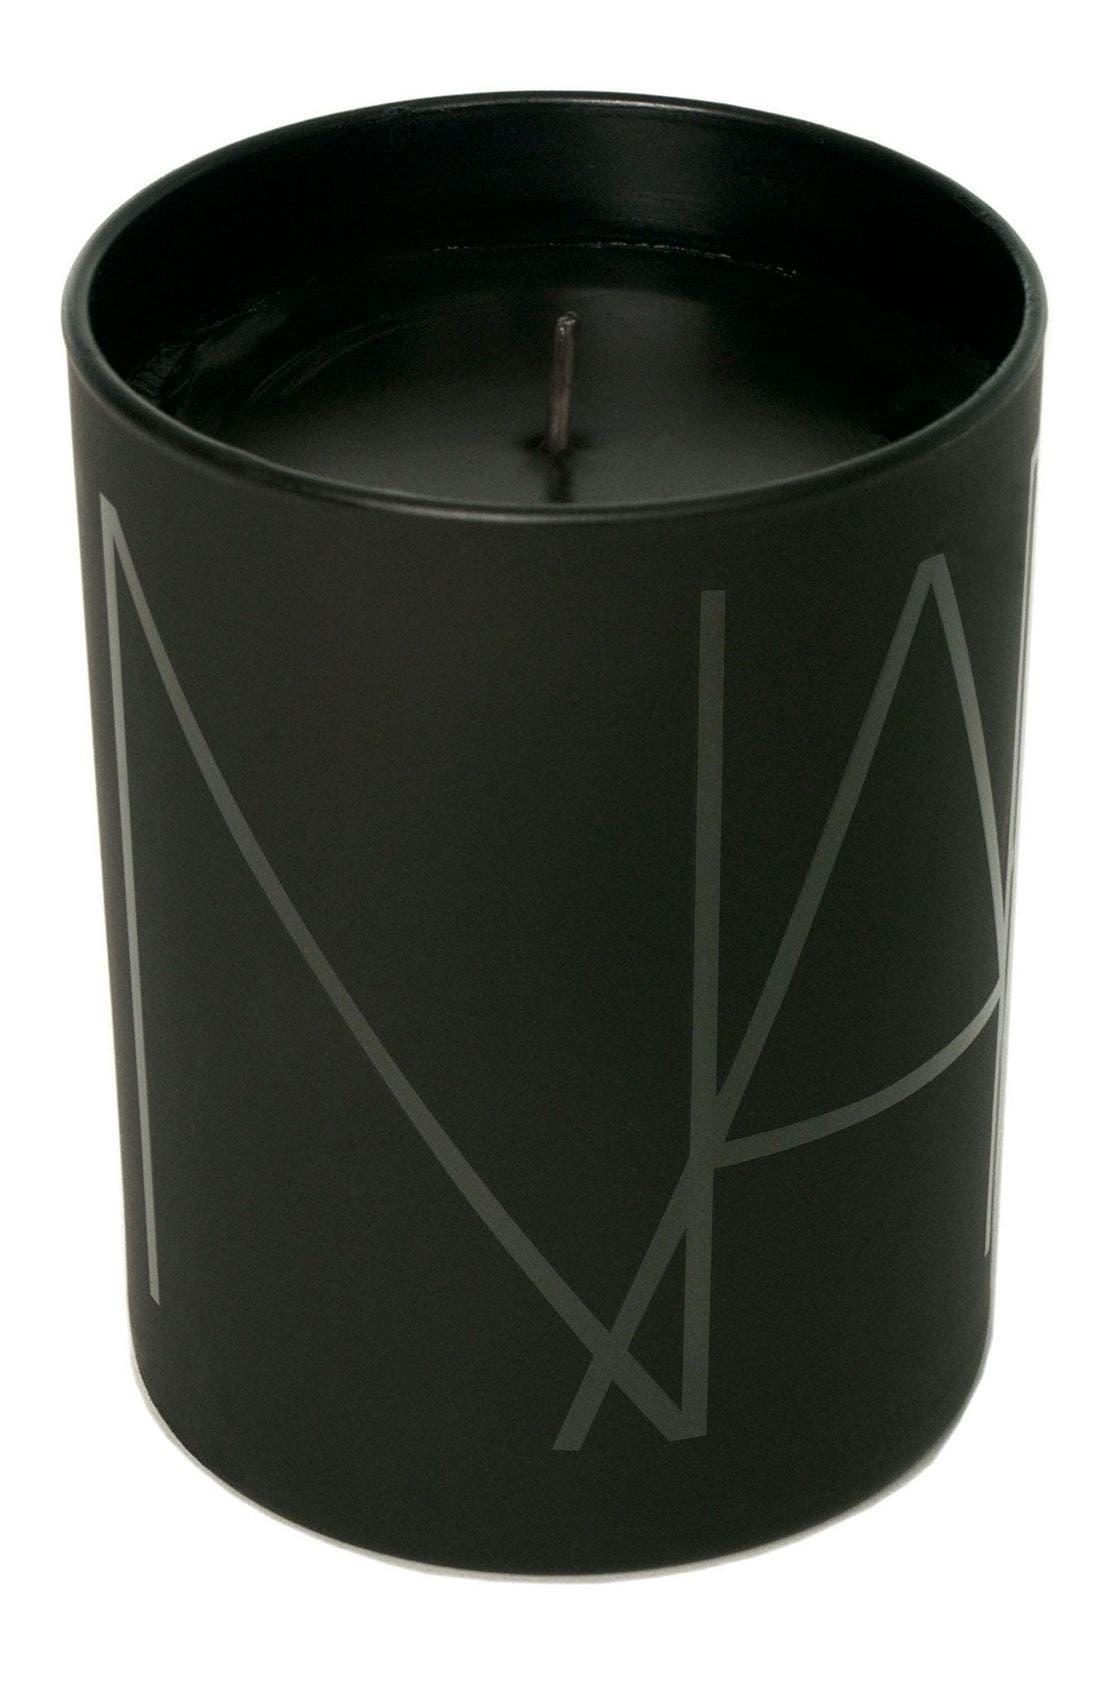 Main Image - NARS Acapulco Candle